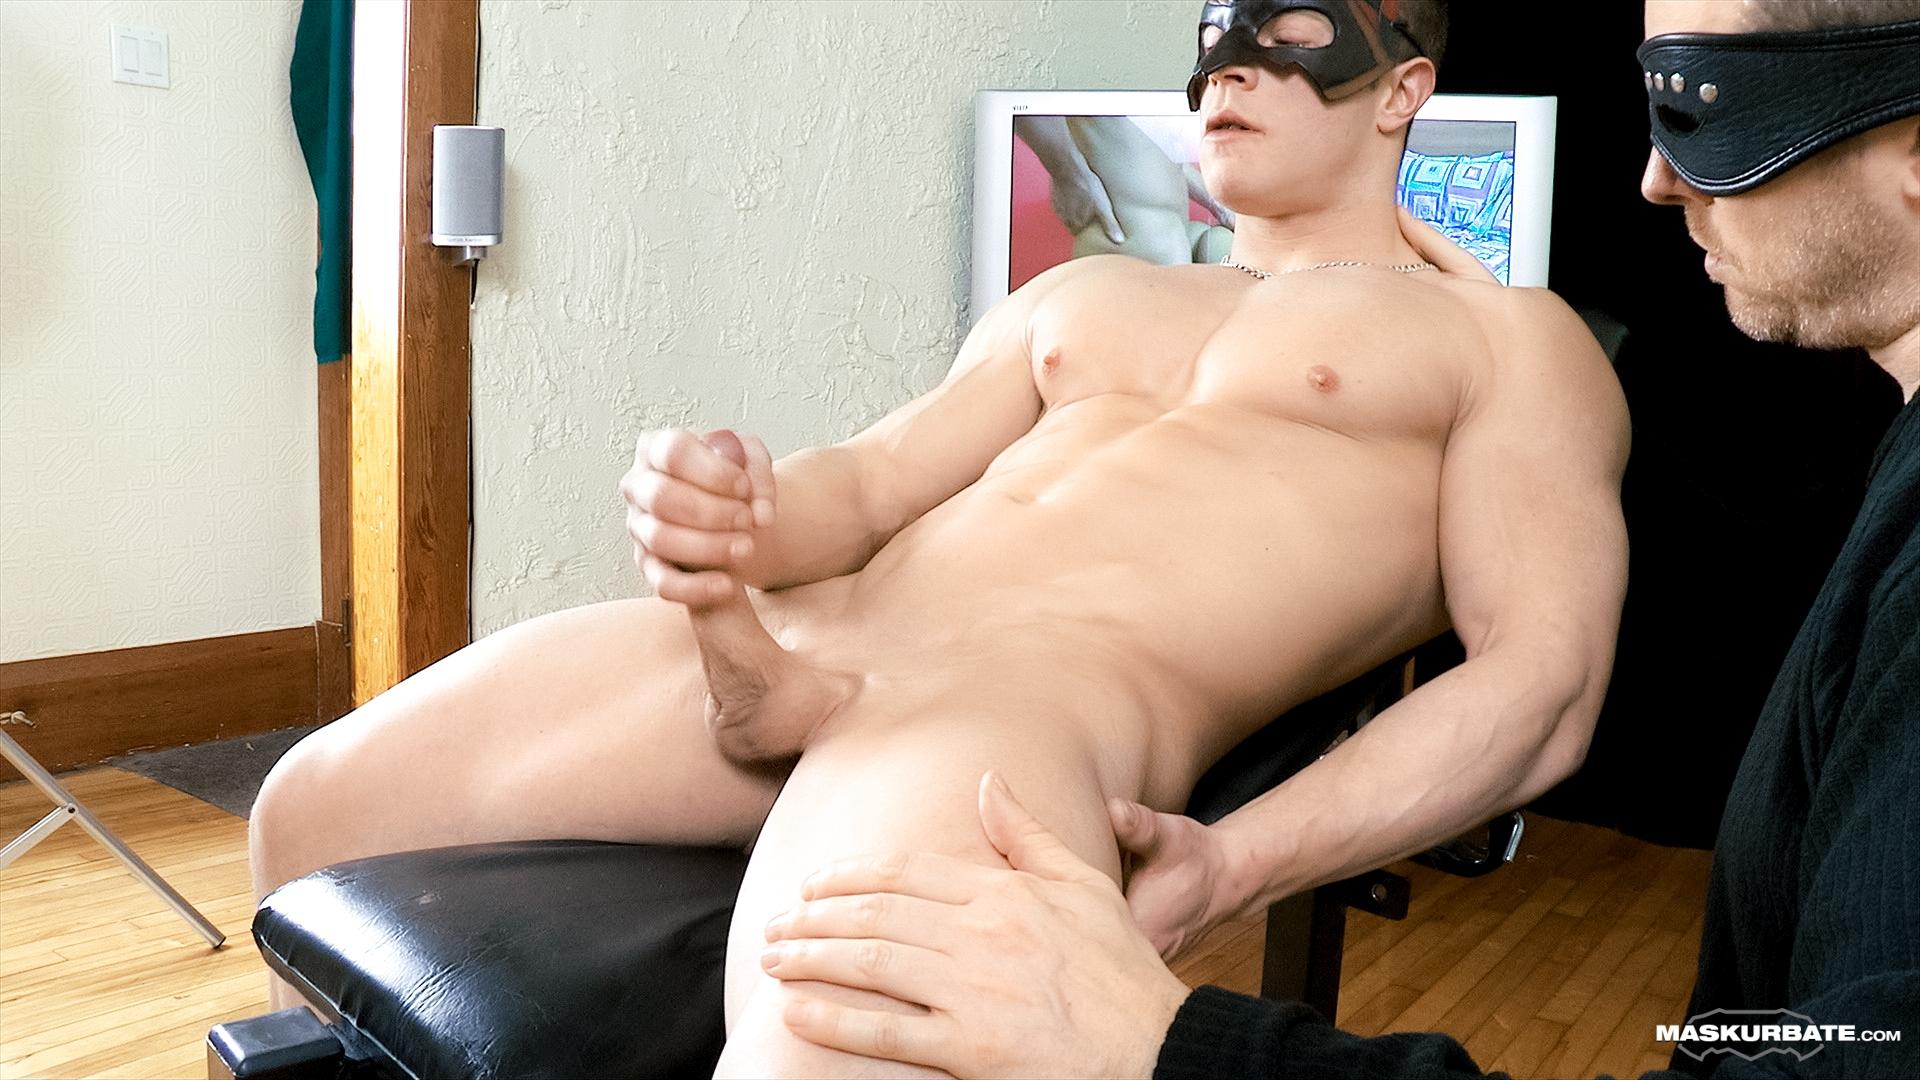 Hot Nude Photos Stroking his huge cock